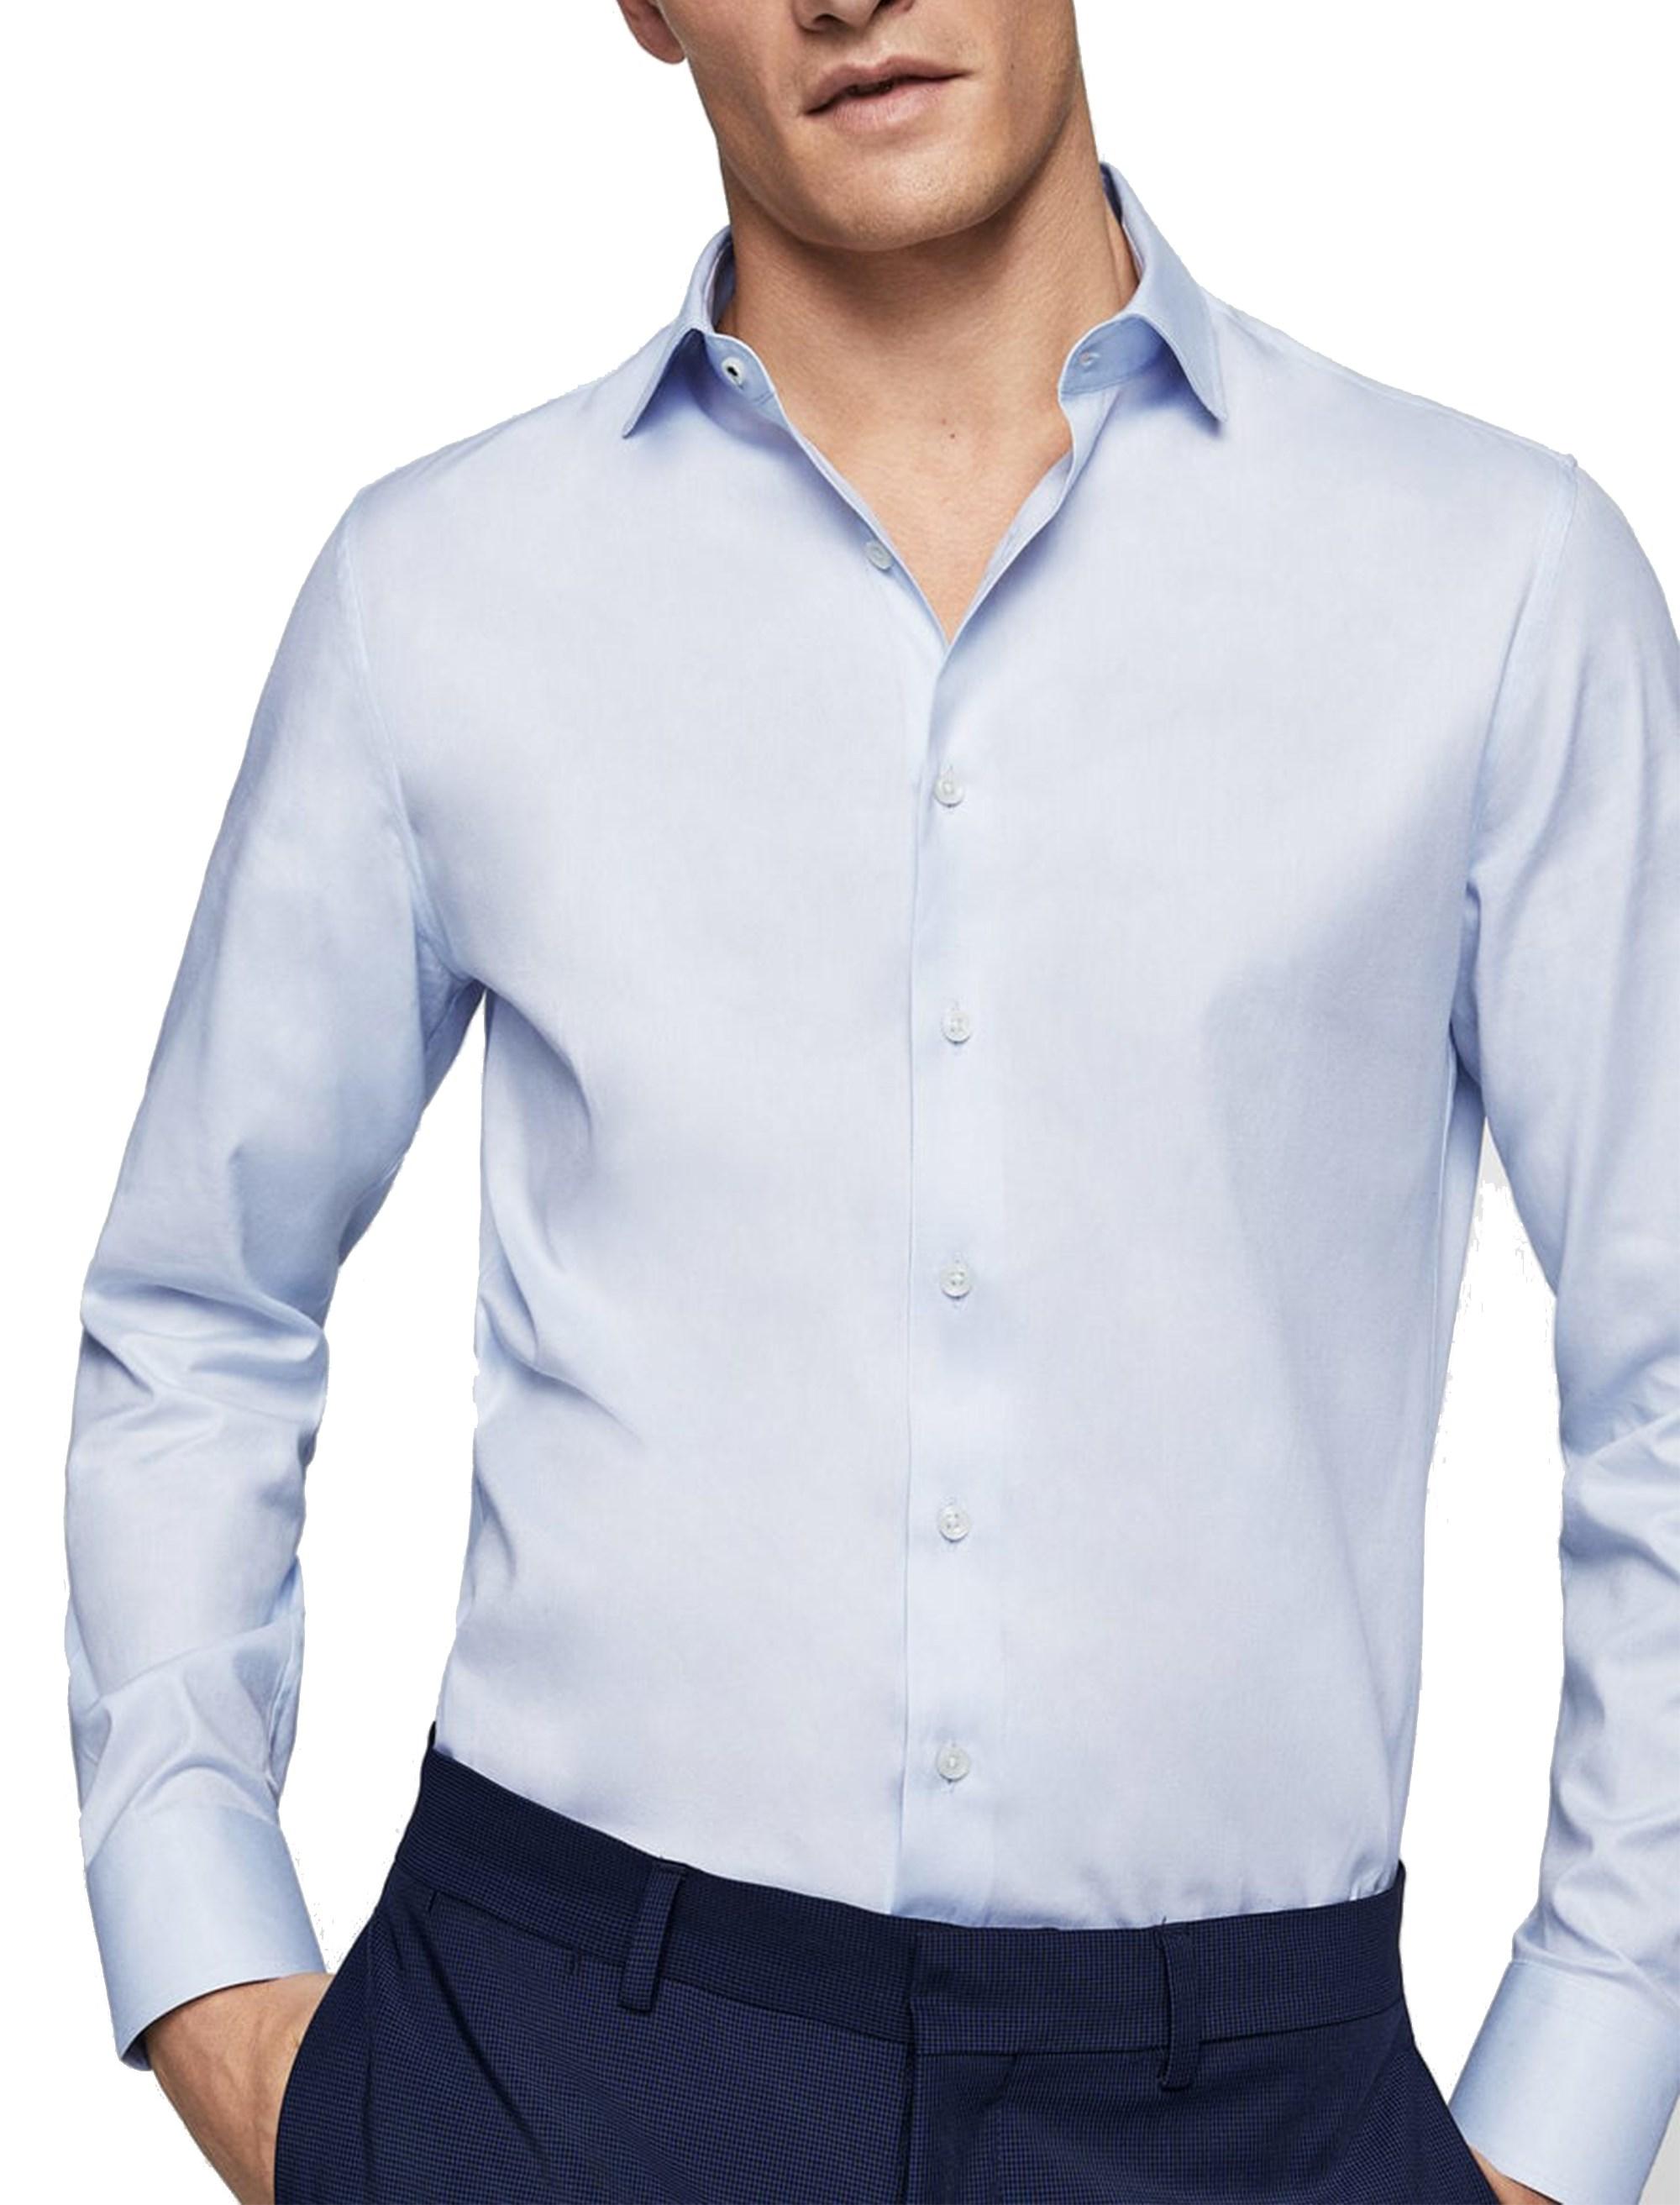 پیراهن نخی آستین بلند مردانه - آبي روشن - 1